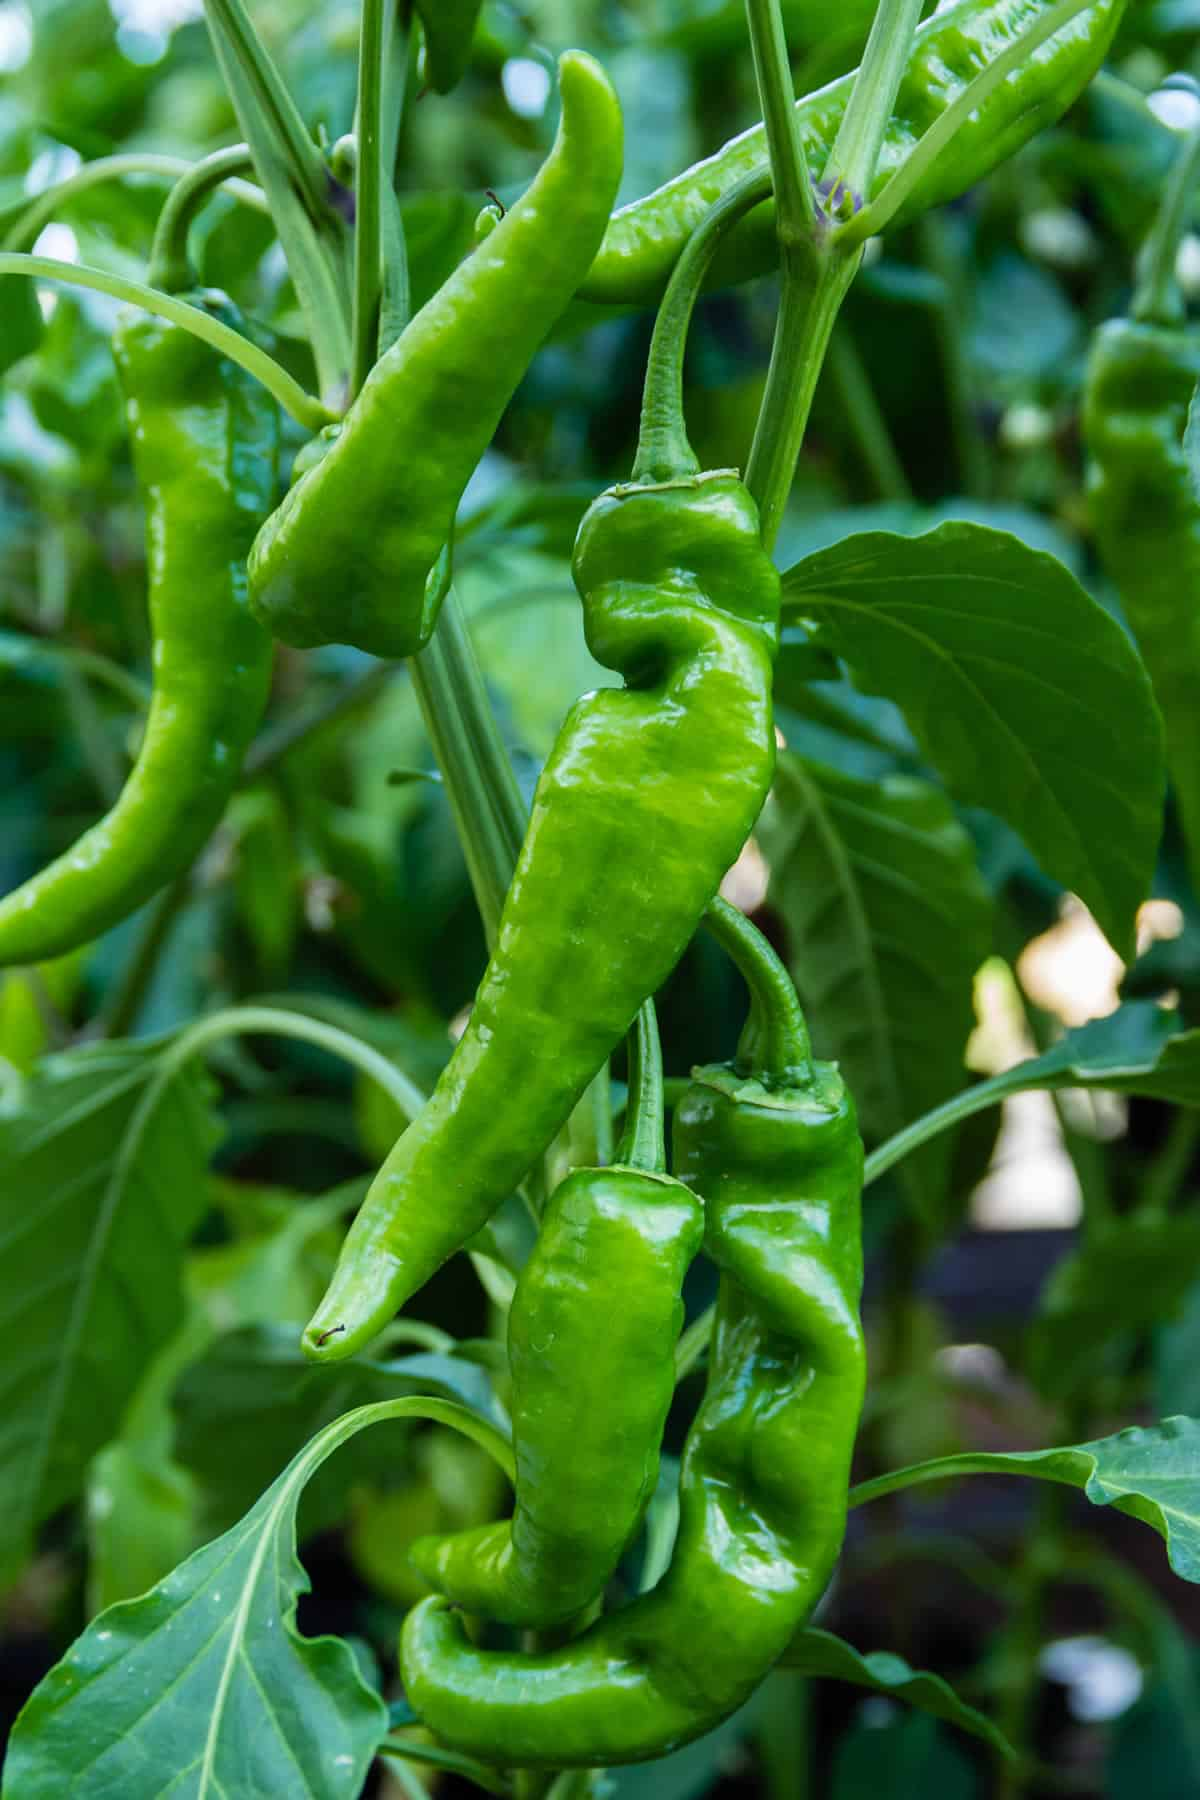 Anaheim Pepper: A Popular Mild California Chili